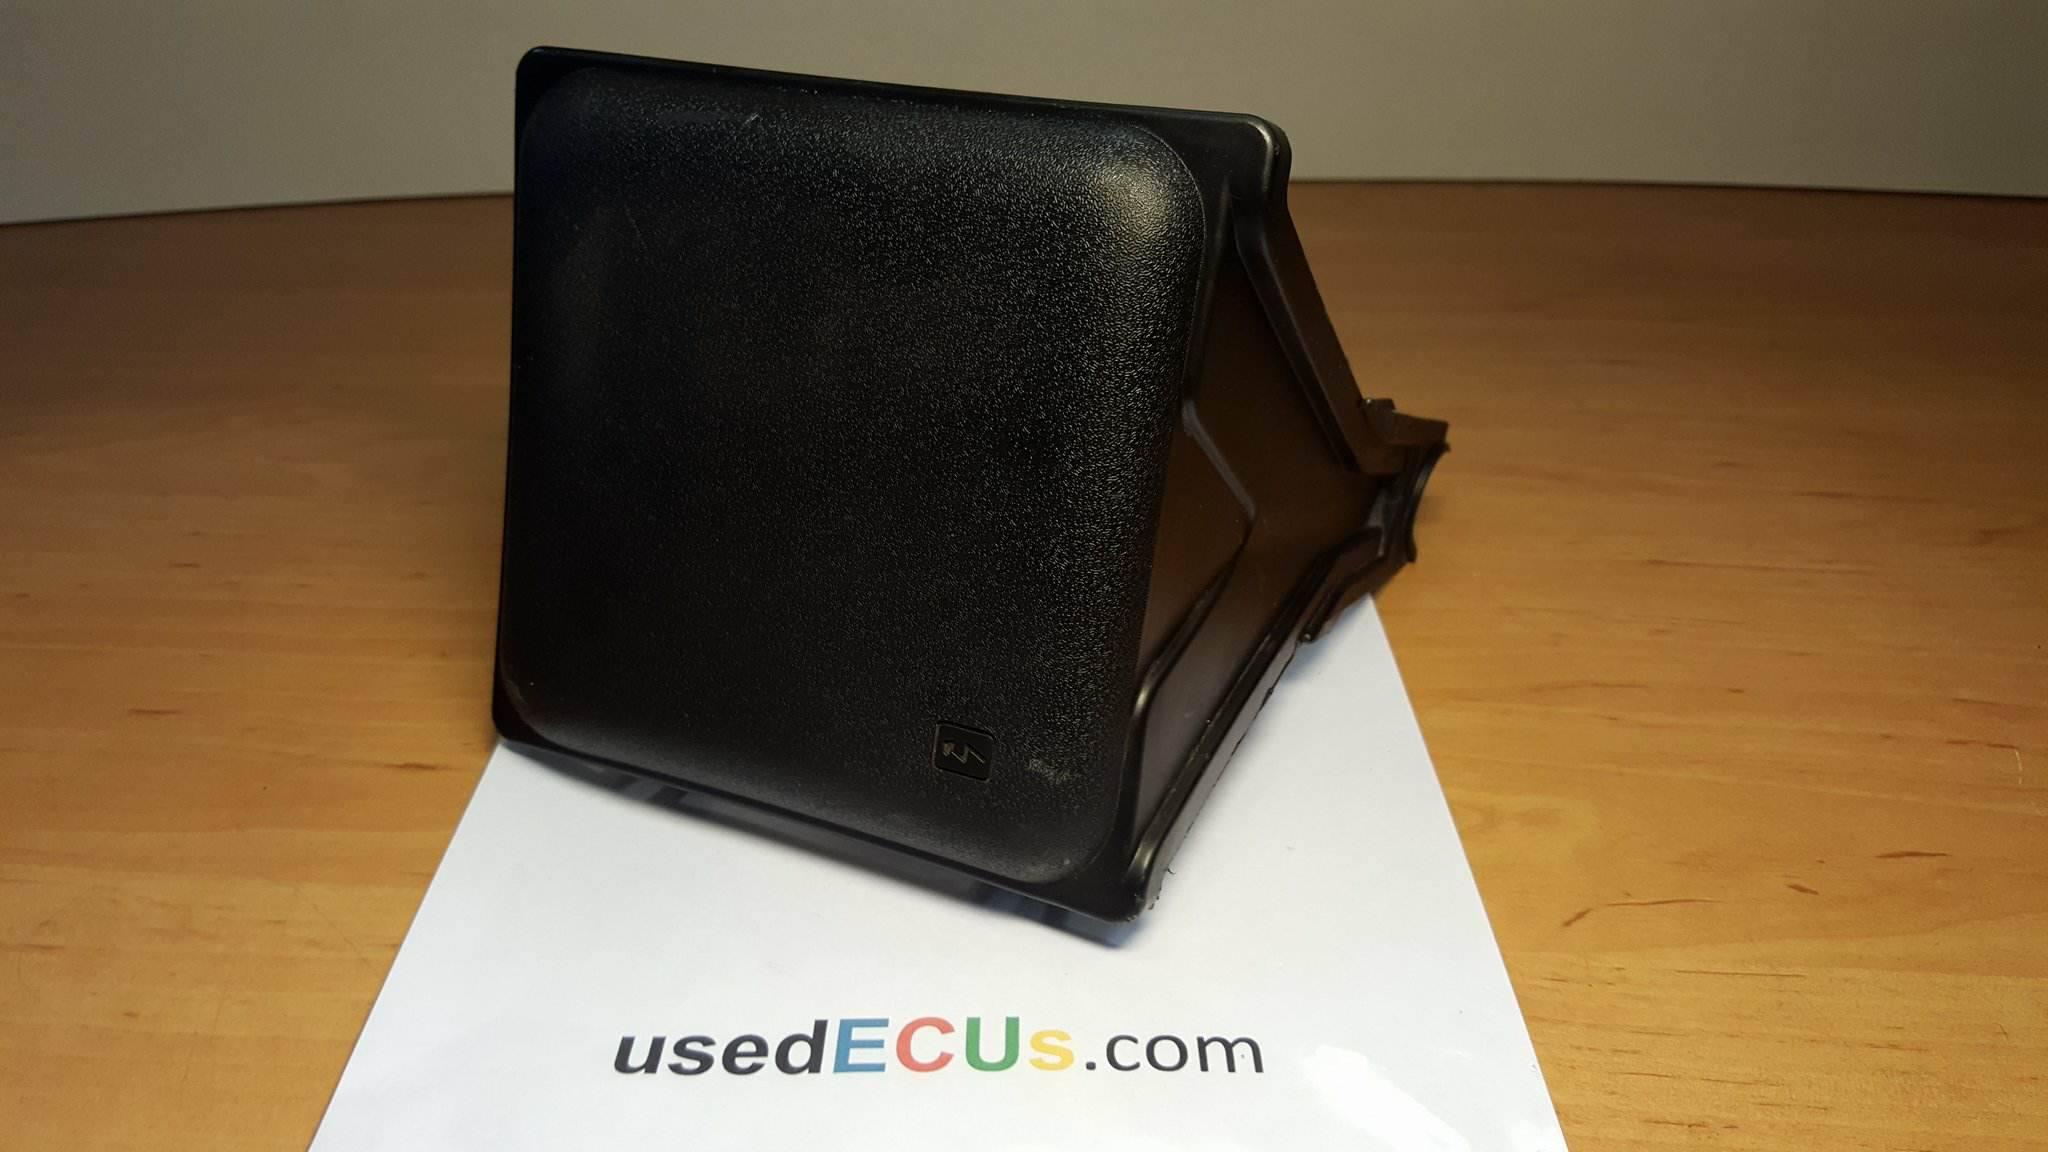 renault laguna fuse box cover